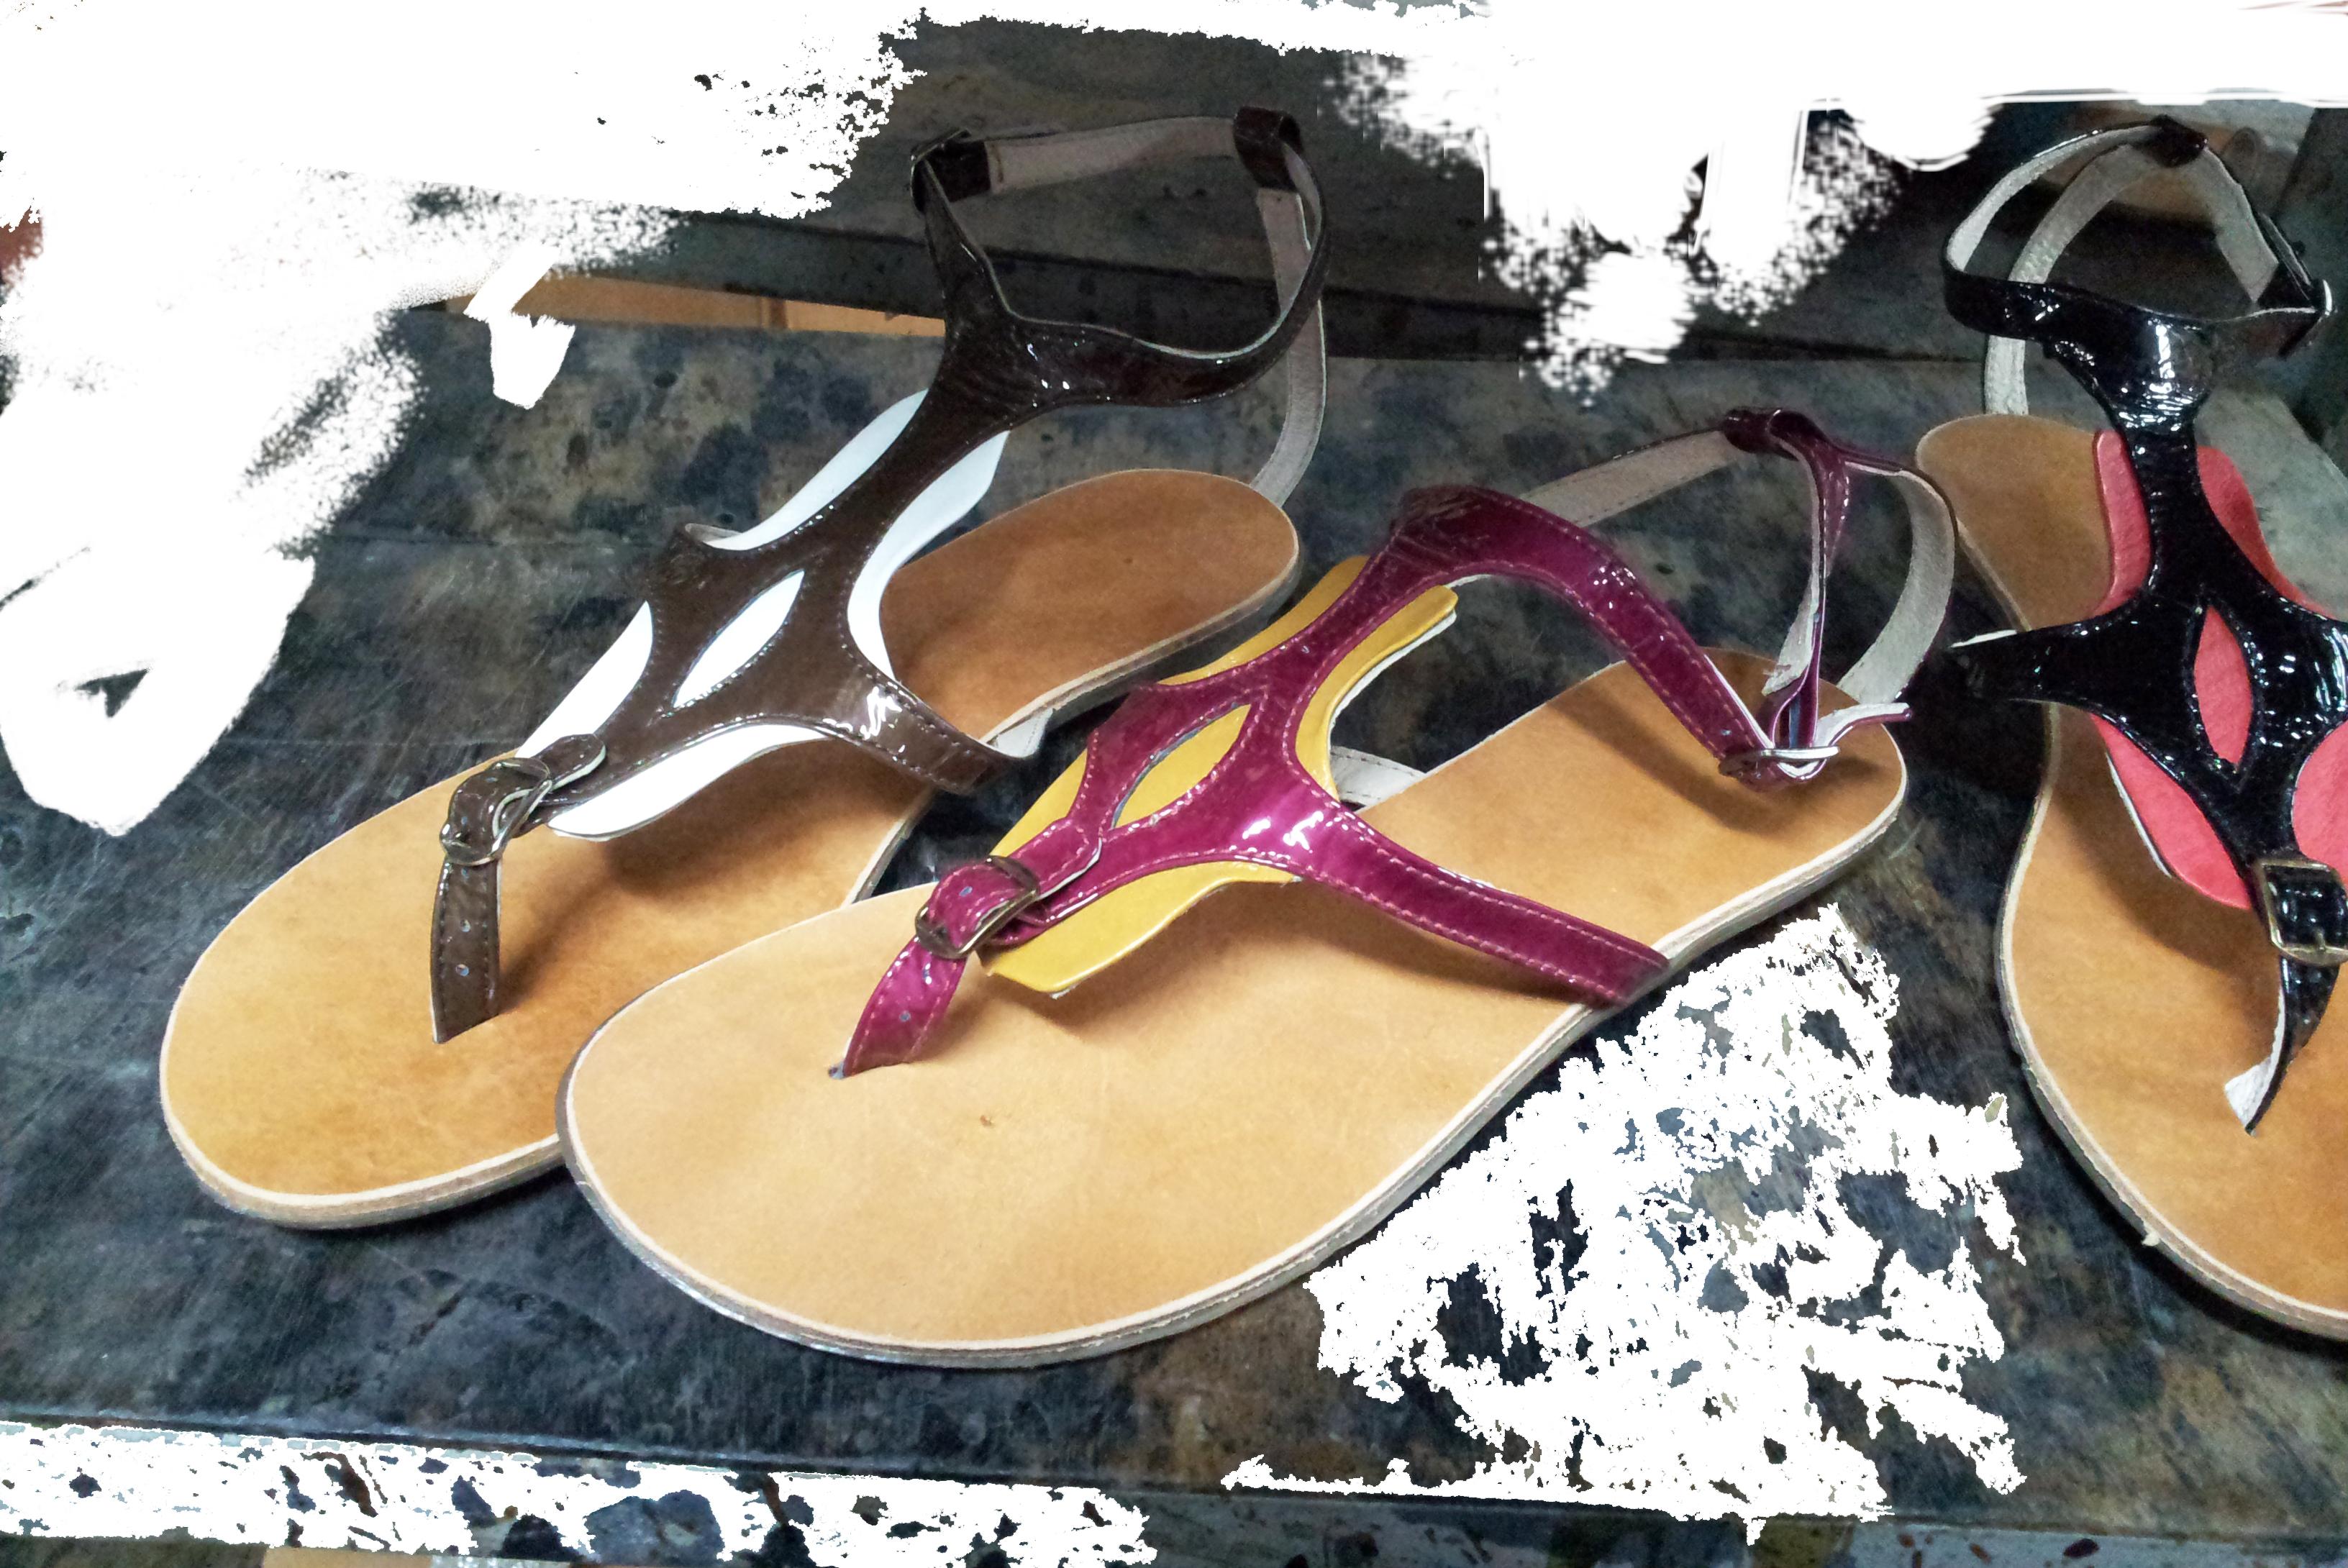 Sandals made